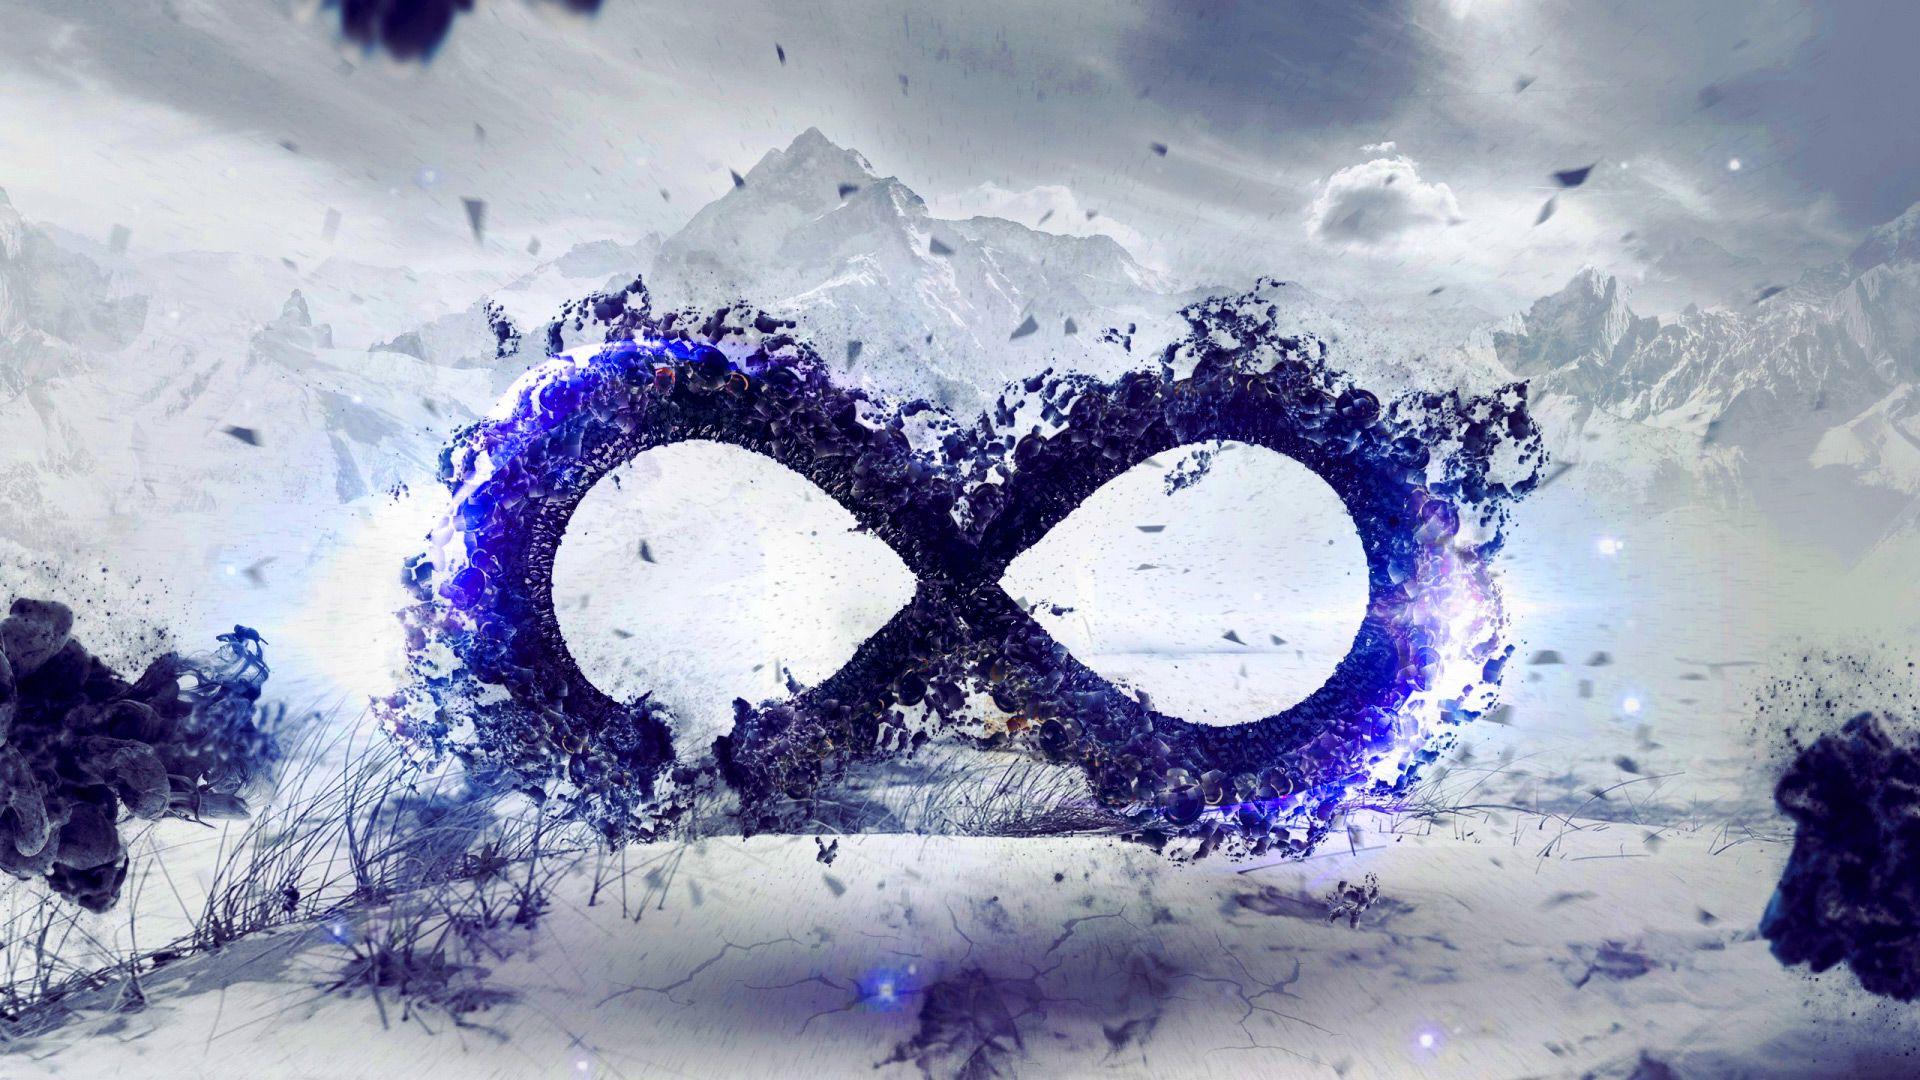 3d logo infinity wallpaper hd picture blue color logo infinity 3d logo infinity wallpaper hd picture blue color logo buycottarizona